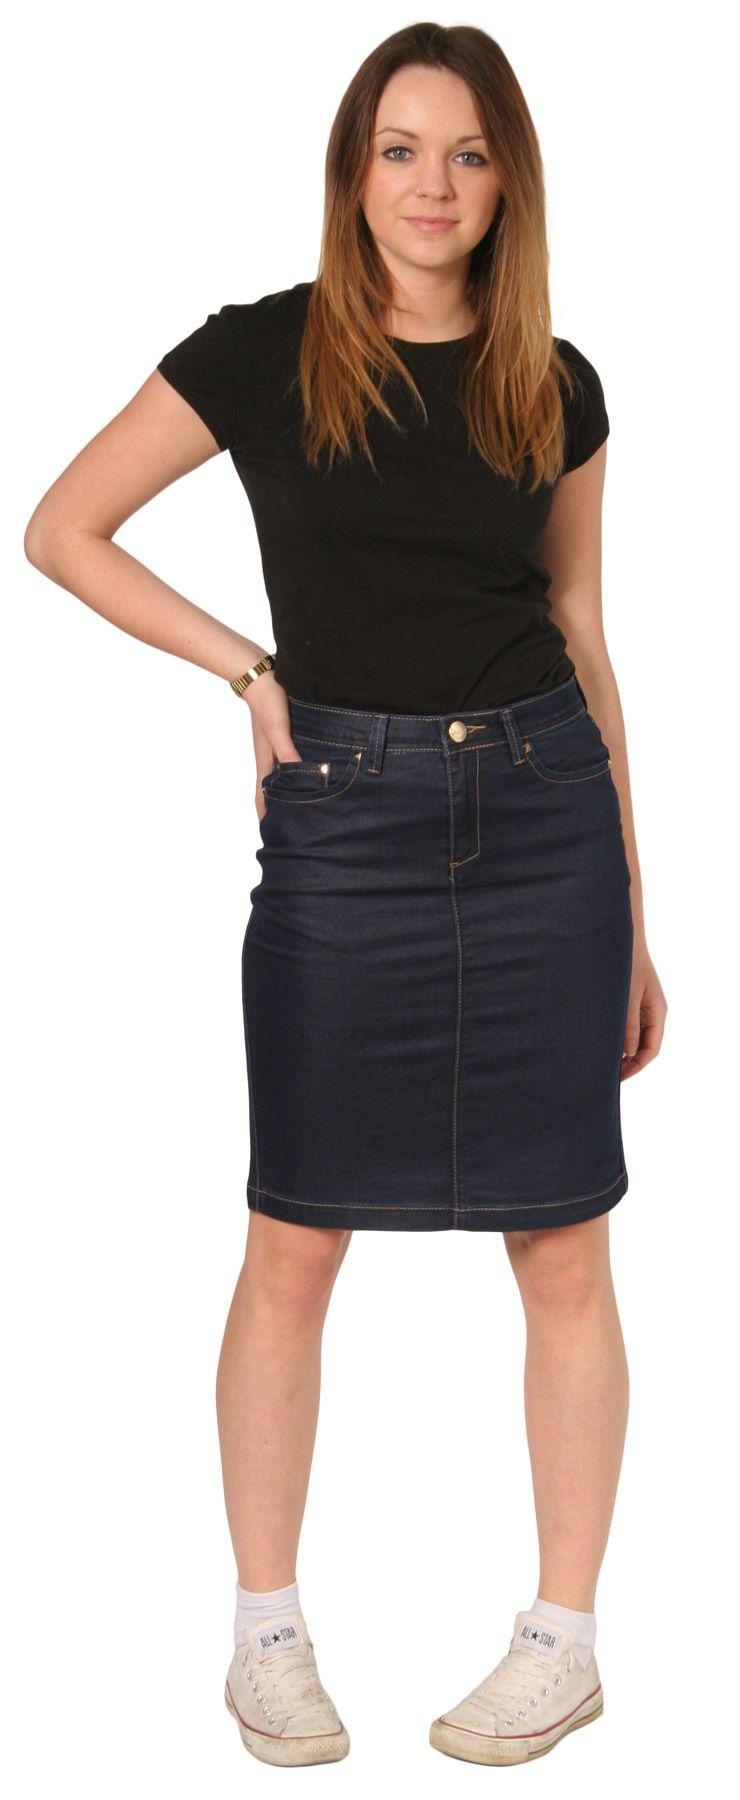 b446314b4 Cute Dark Indigo Blue Denim Skirt (SKIRT61)     Girls in jeans skirts